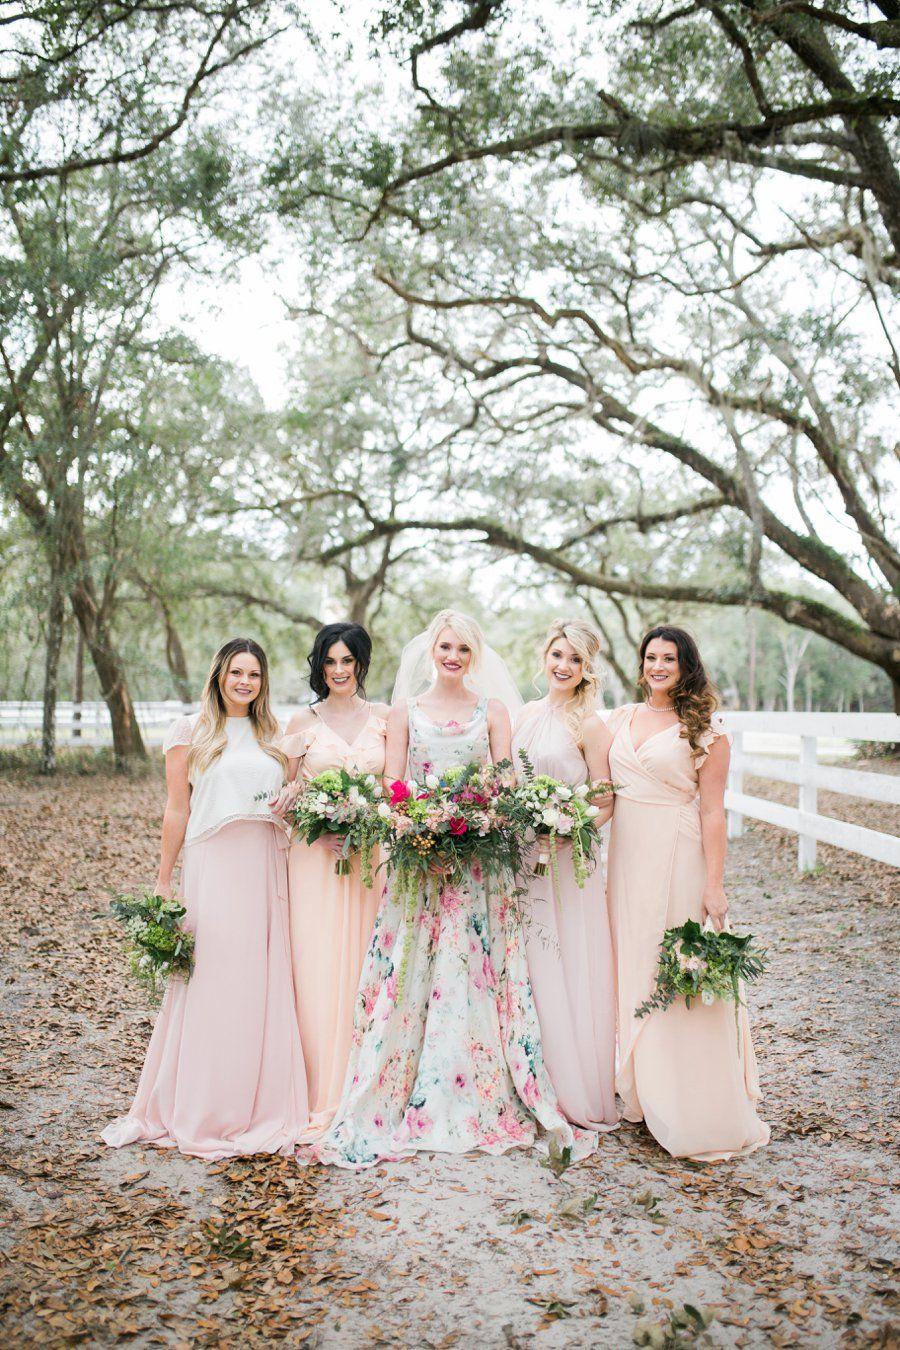 Colorful Summer Floral Citrus Wedding Ideas Every Last Detail Summer Bridesmaid Dresses Summer Bridesmaids Pink Chiffon Bridesmaid Dress [ 1350 x 900 Pixel ]